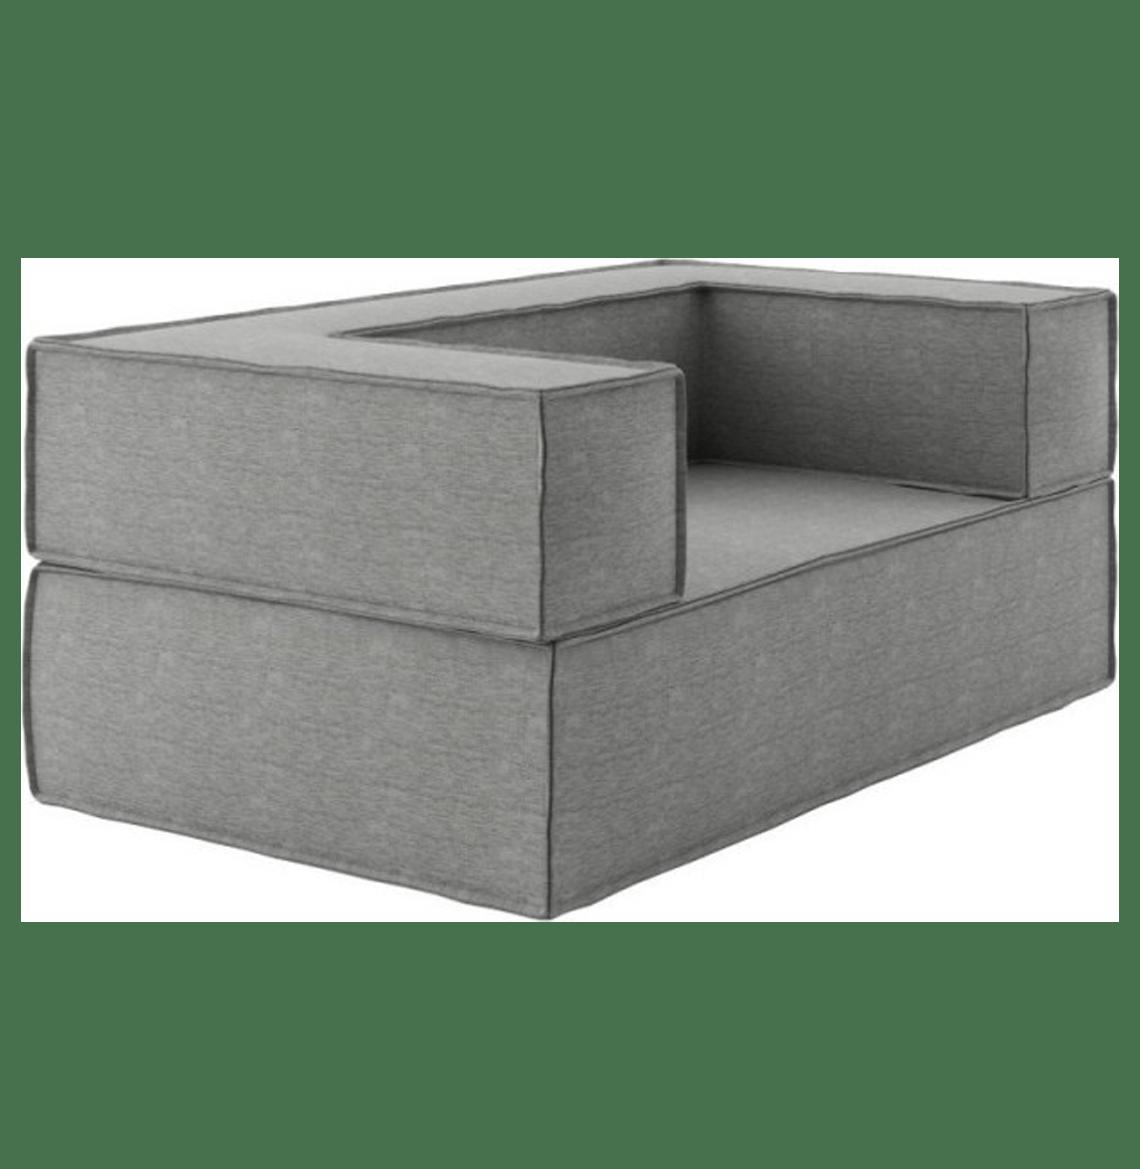 Sofa 150 Basic – Colectia NOI